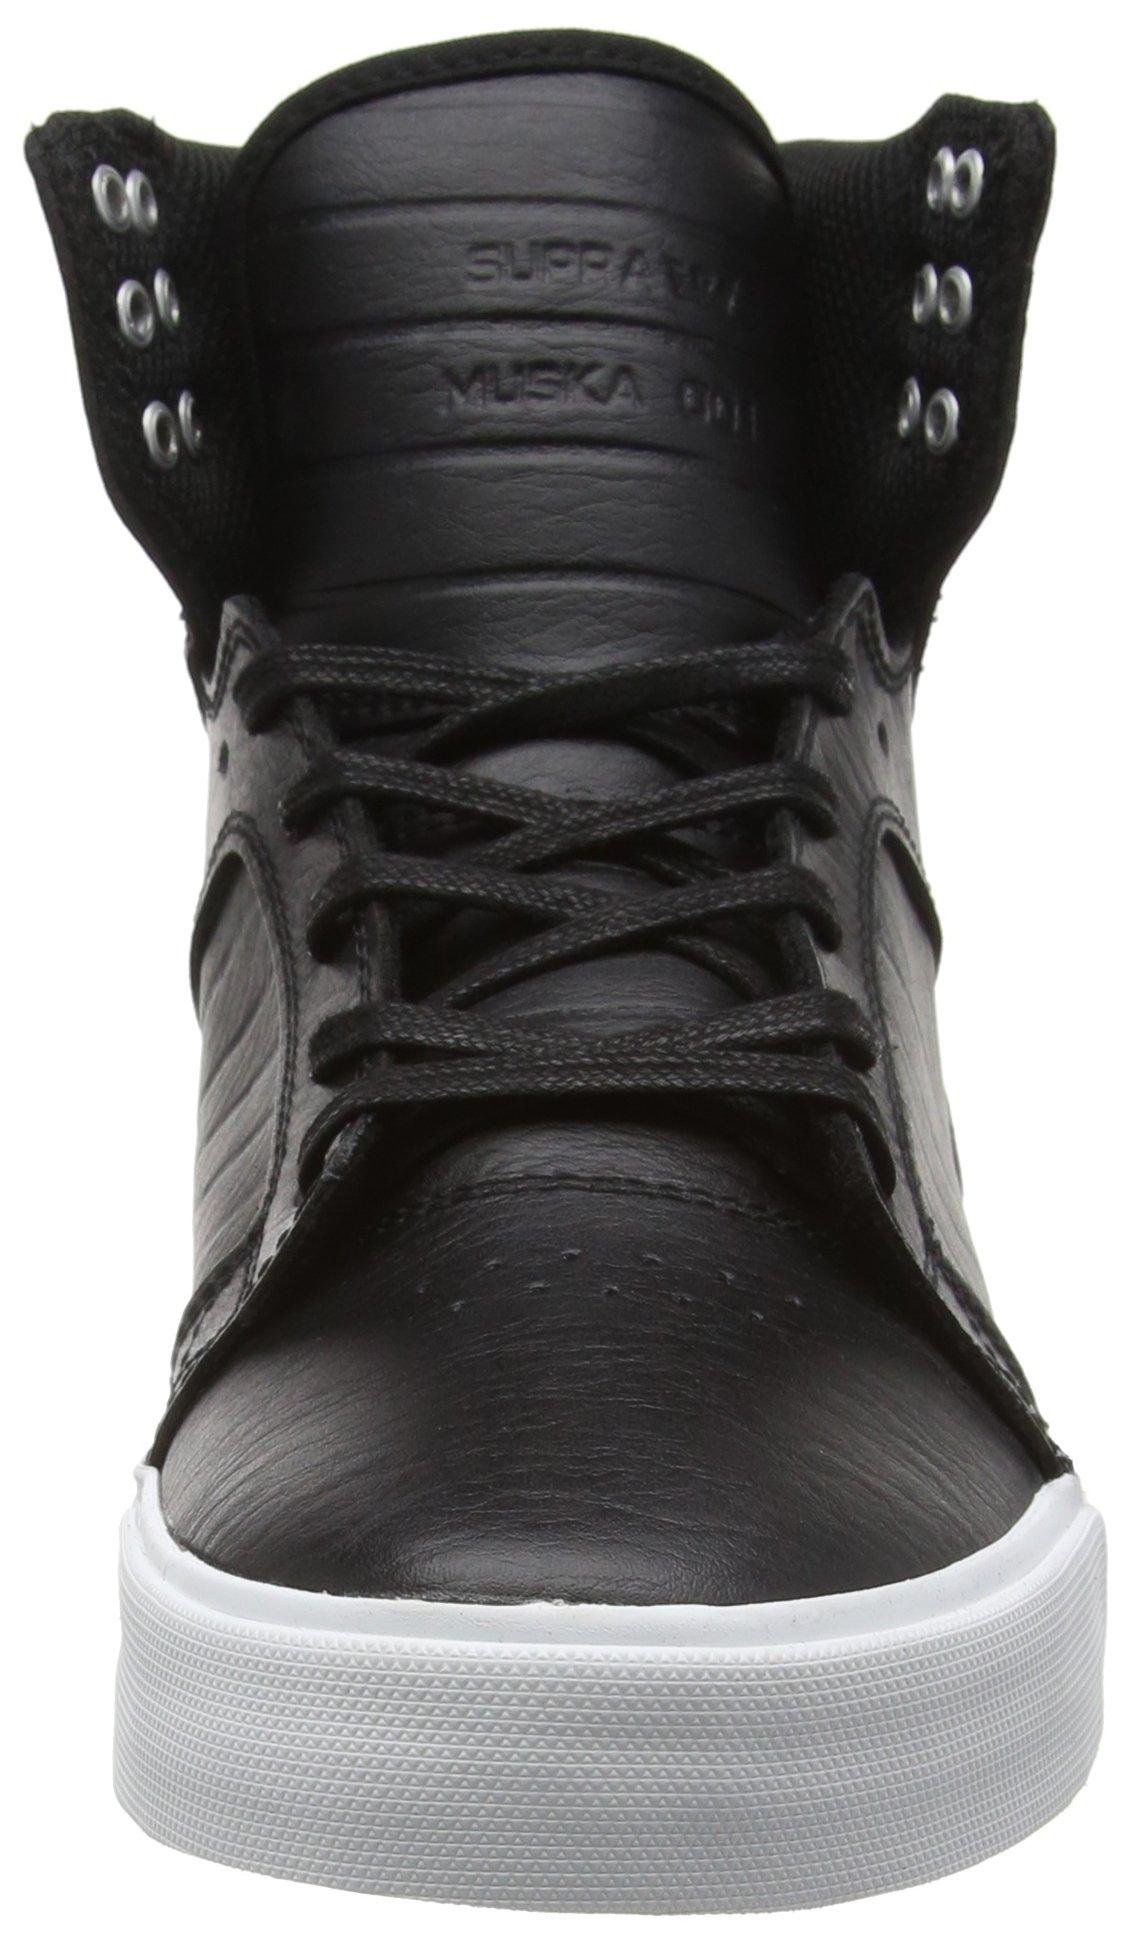 Supra Skytop Skate Shoe, Black/White, 5.5 Regular US by Supra (Image #4)